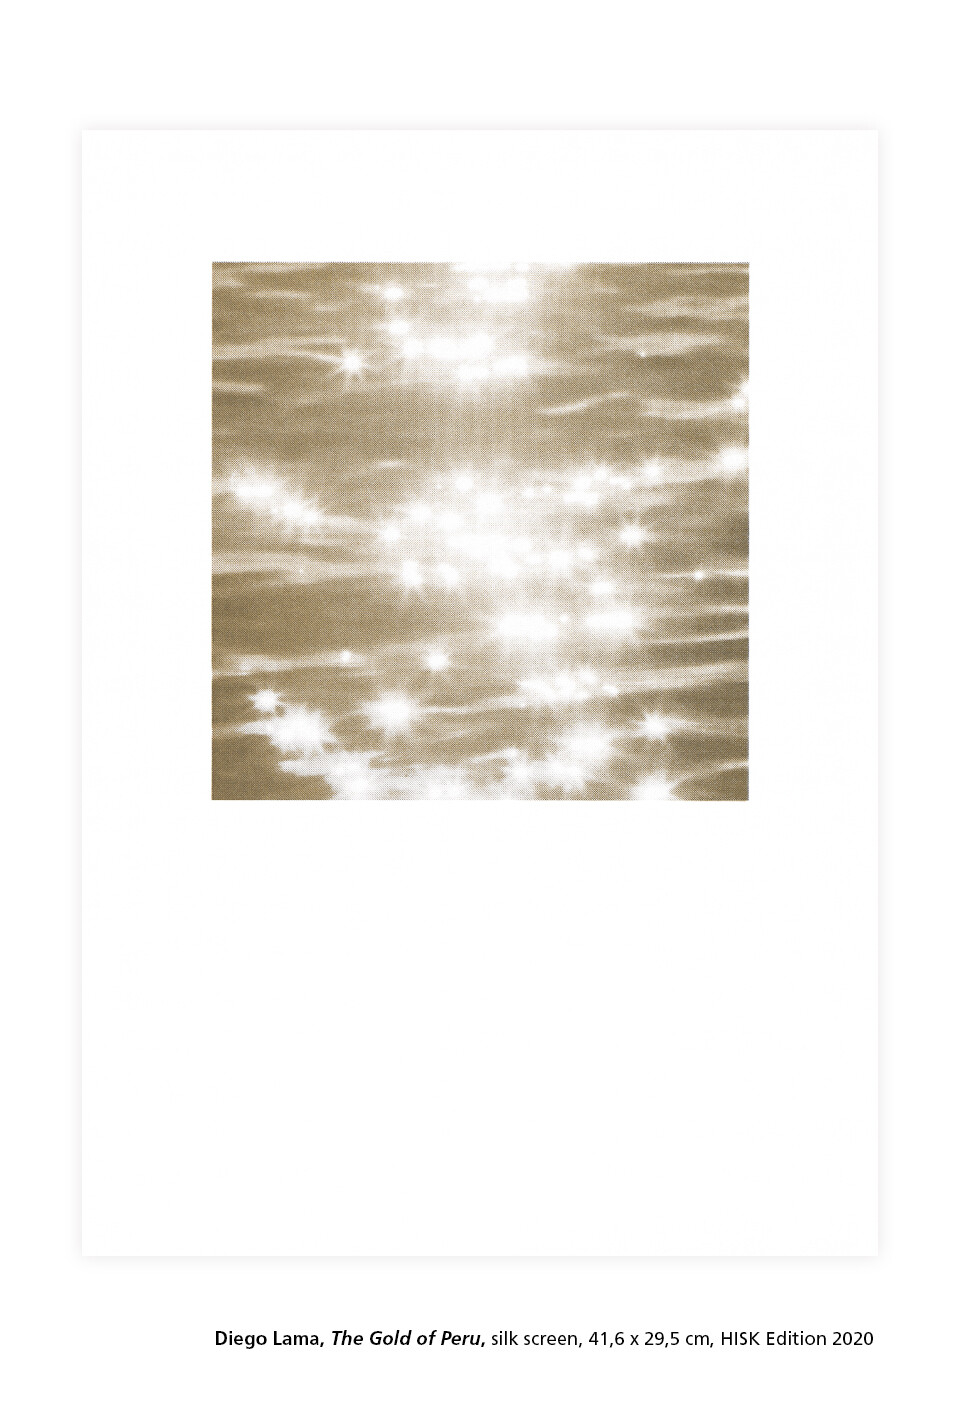 HISK edition 2020 - complete set of 22 prints